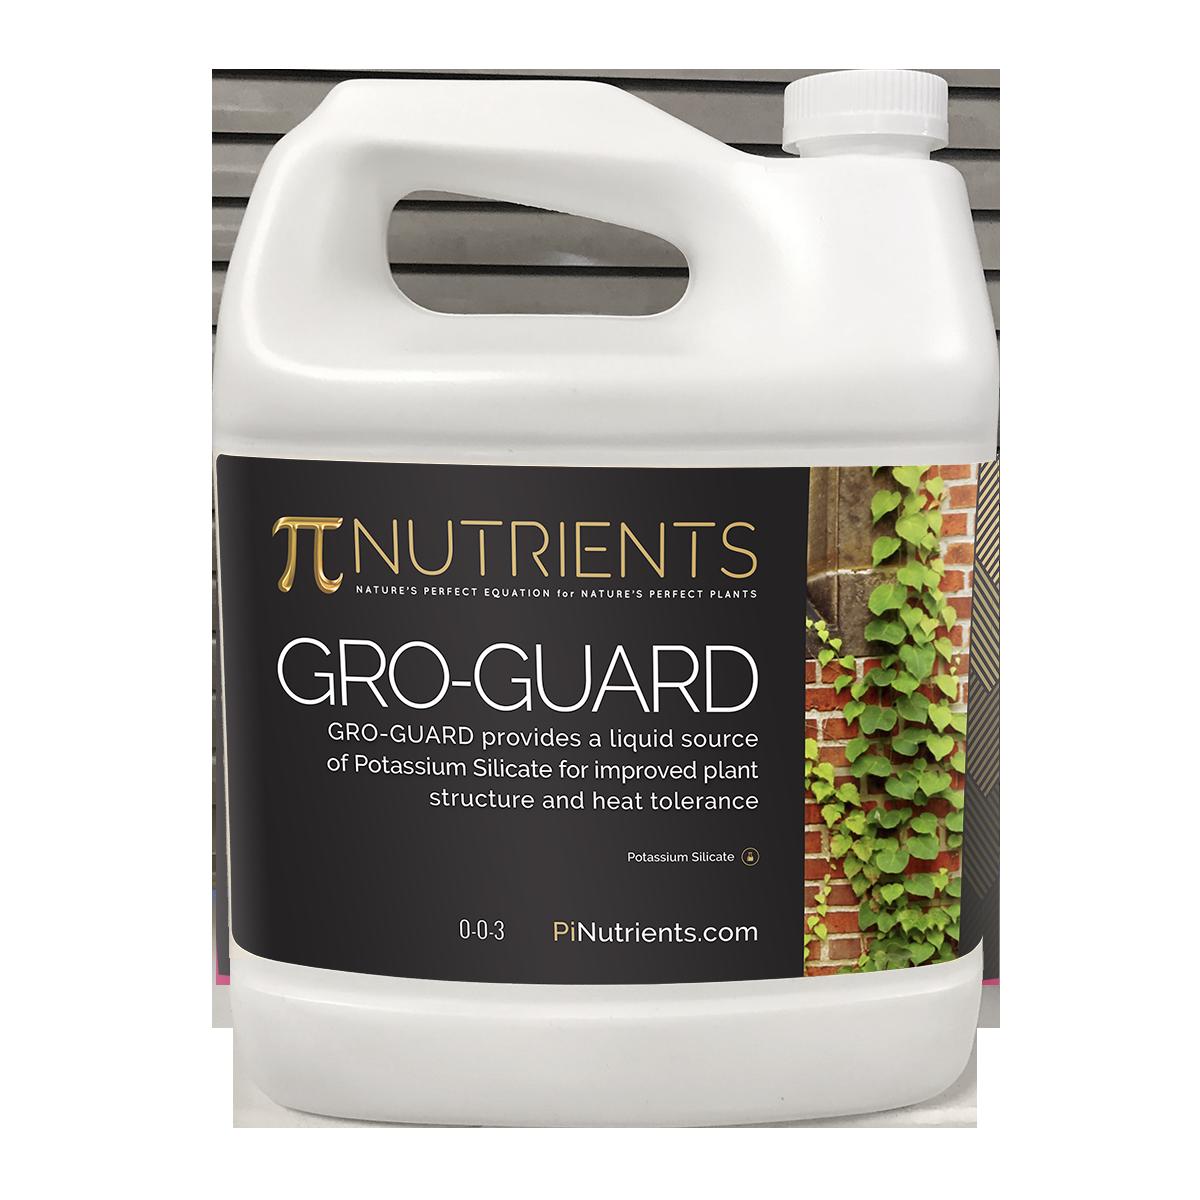 Pi Nutrients Pi Nutrients - Gro-Guard